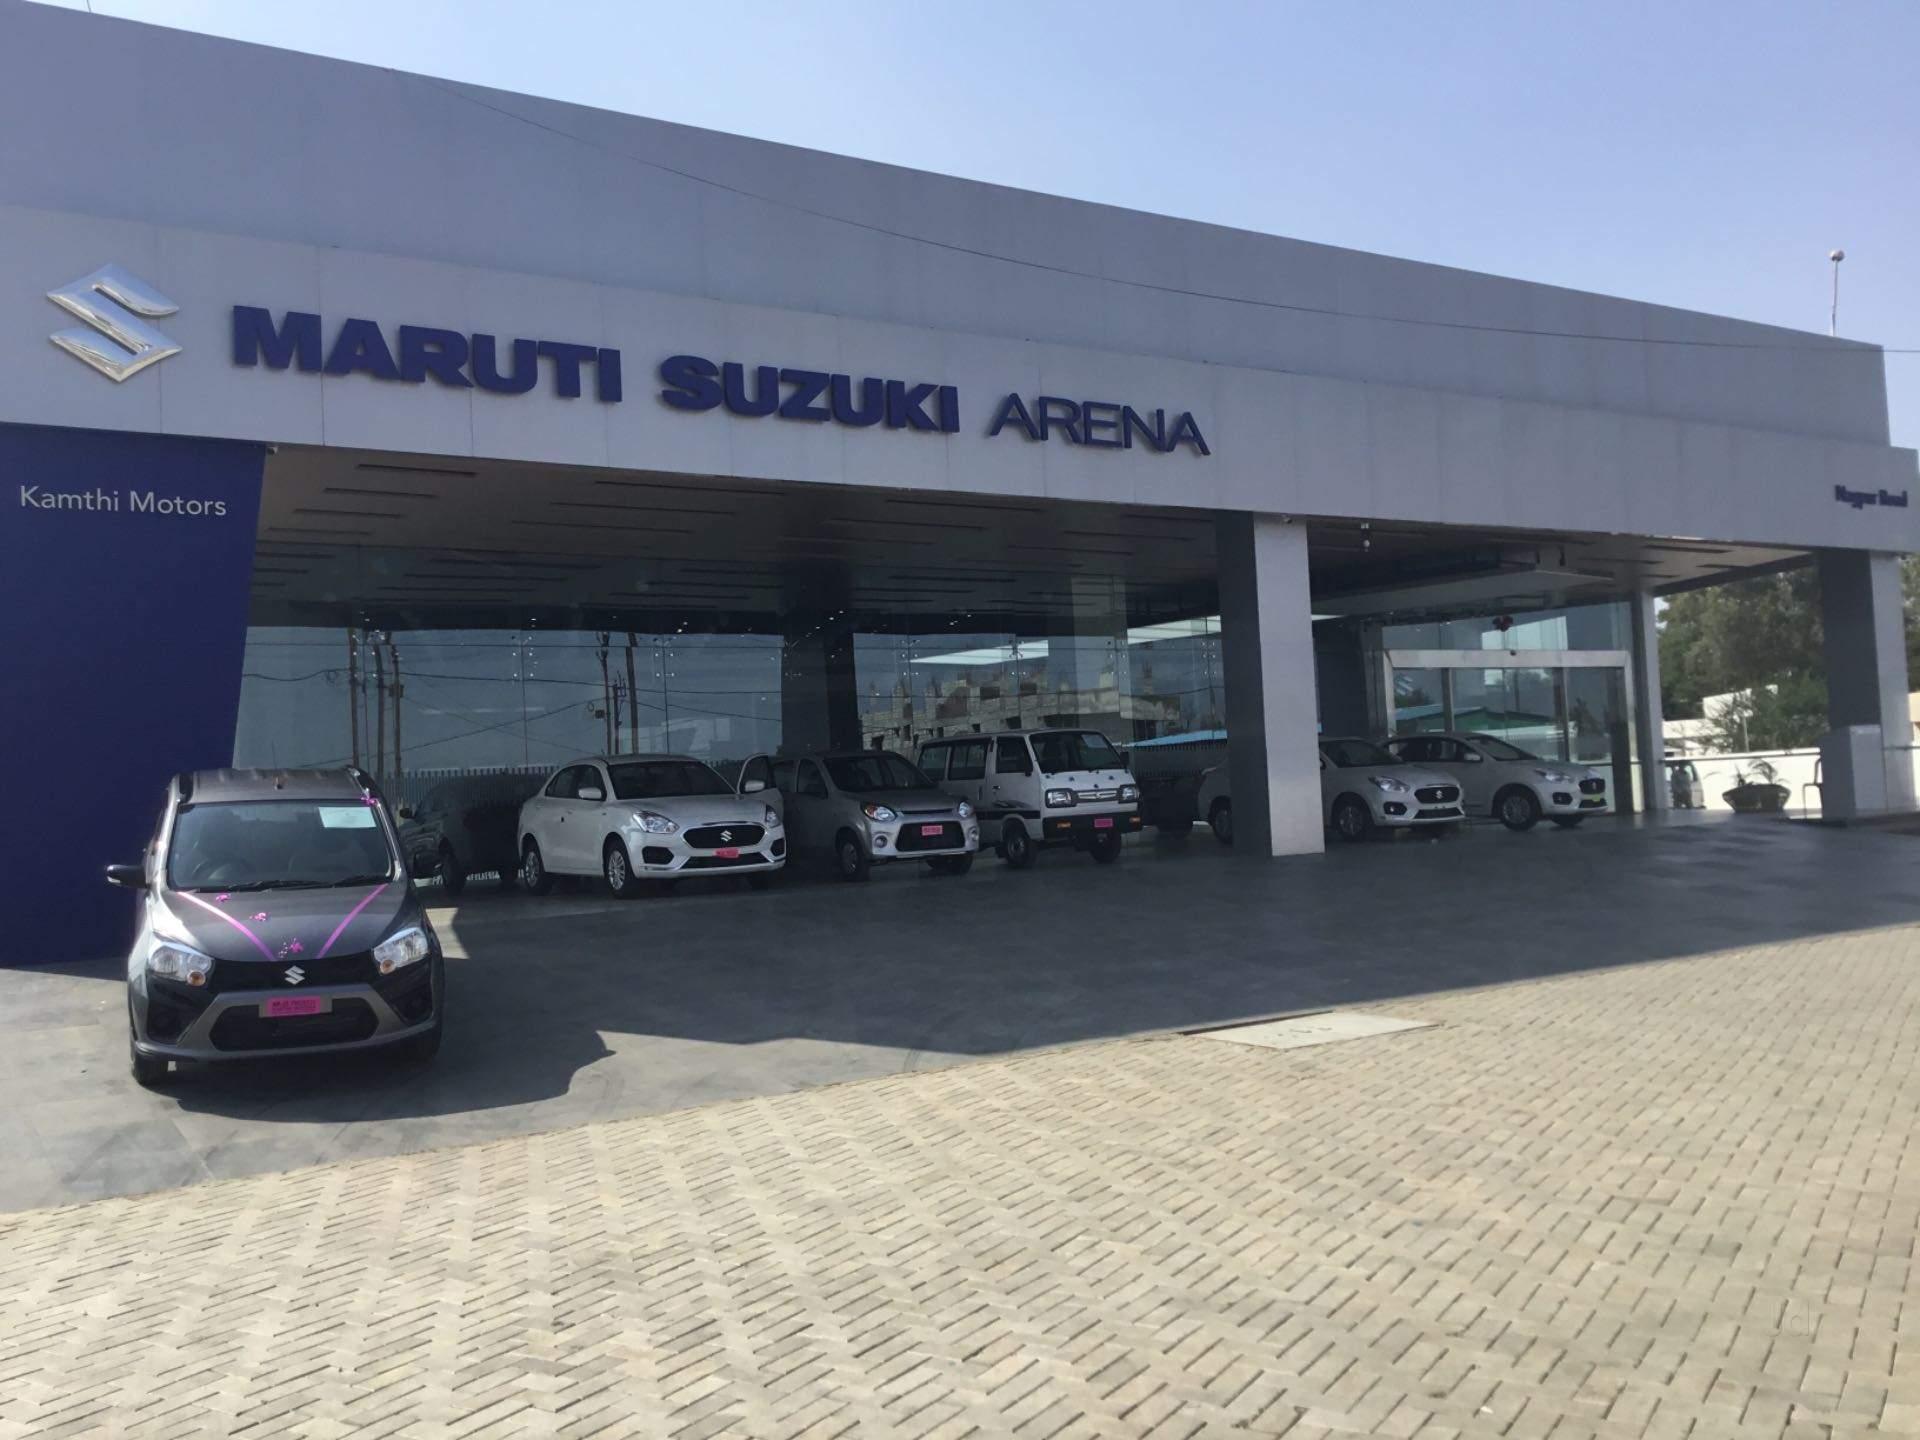 Maruti Suzuki sells over 2 lakh cars through its online sales platform